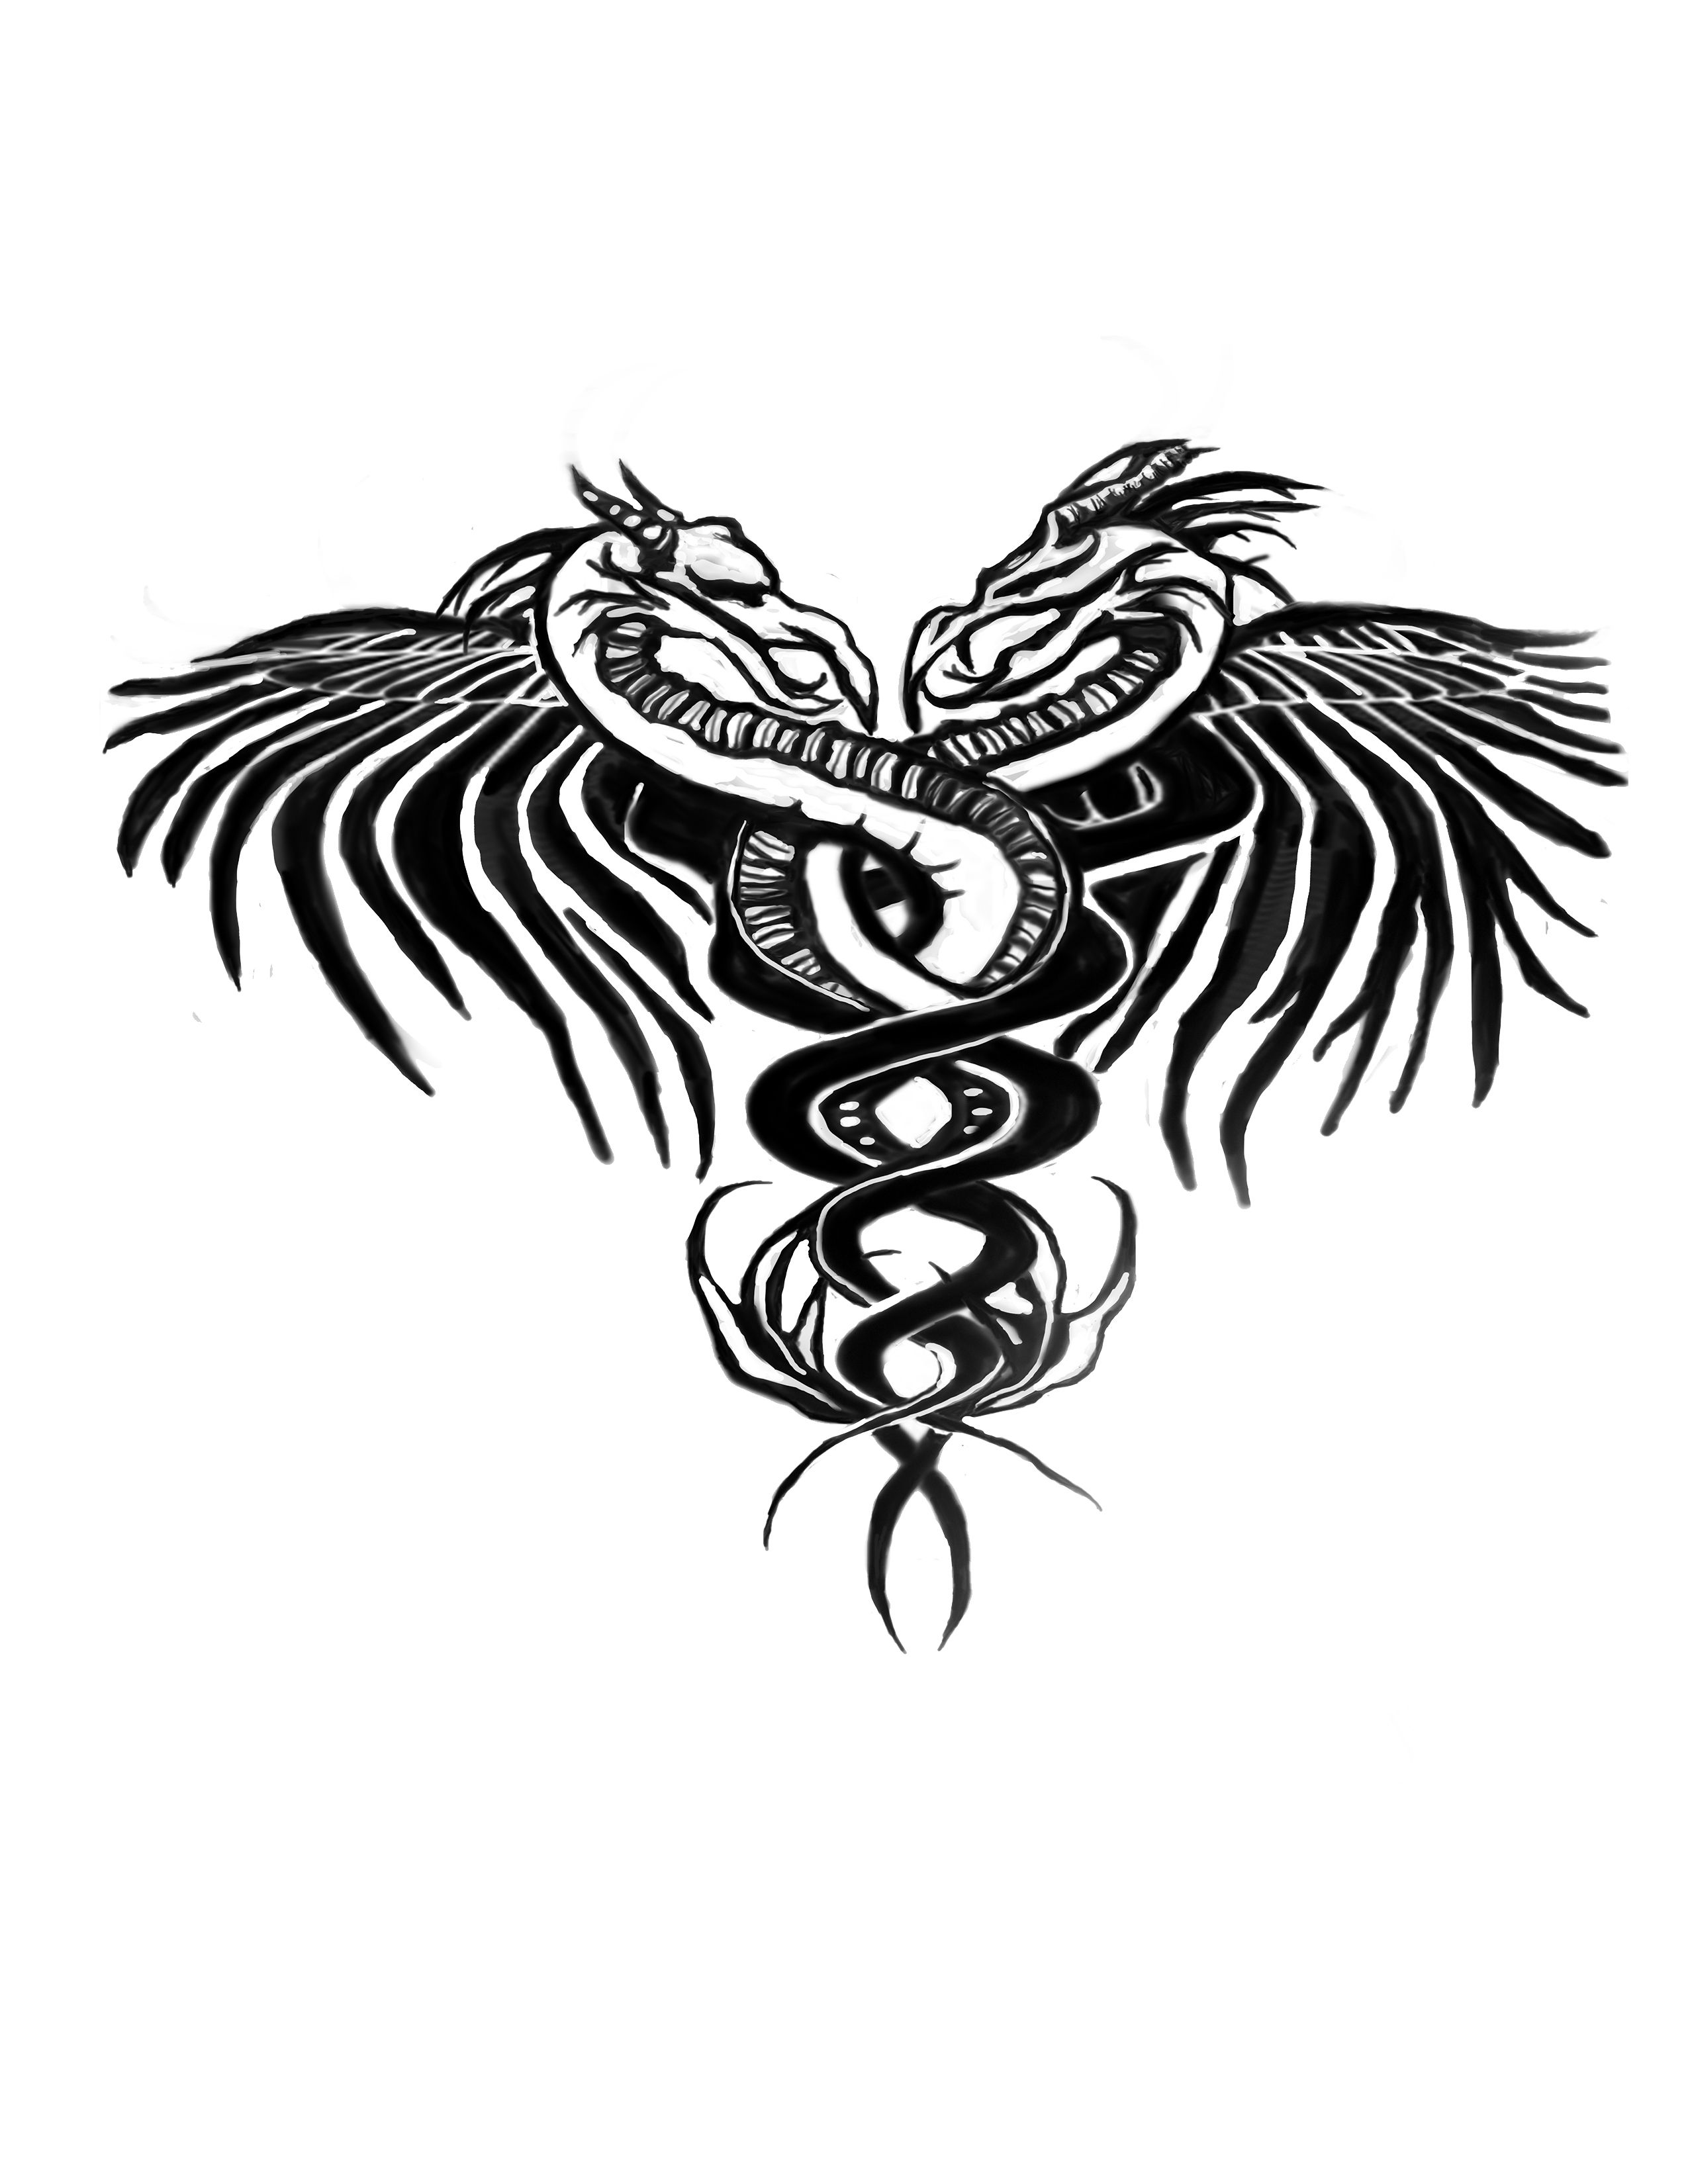 Original Medical Symbol For Indigo Before Revisions Art By Amanda R